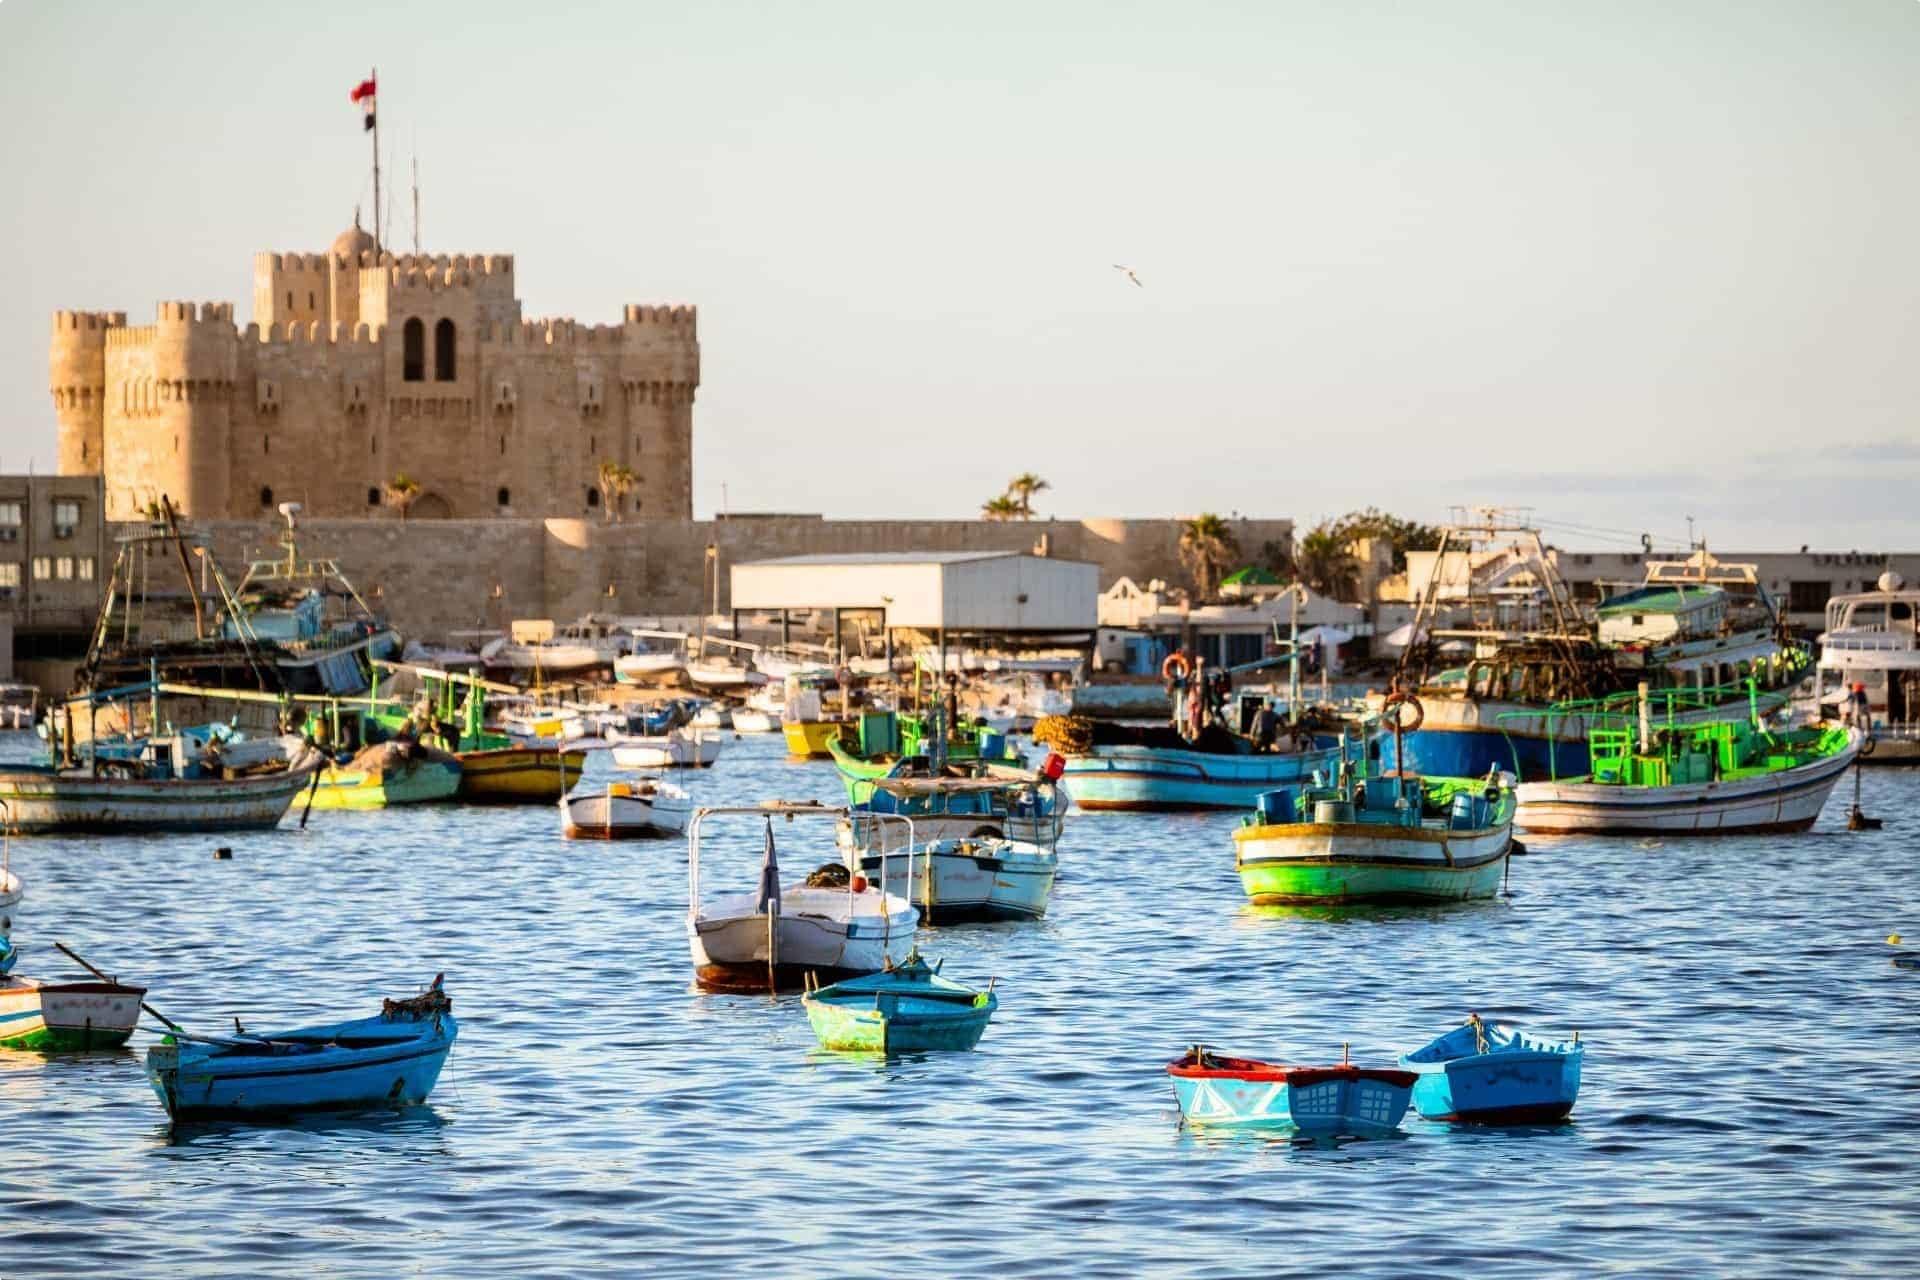 Boats in Alexandria, Egypt